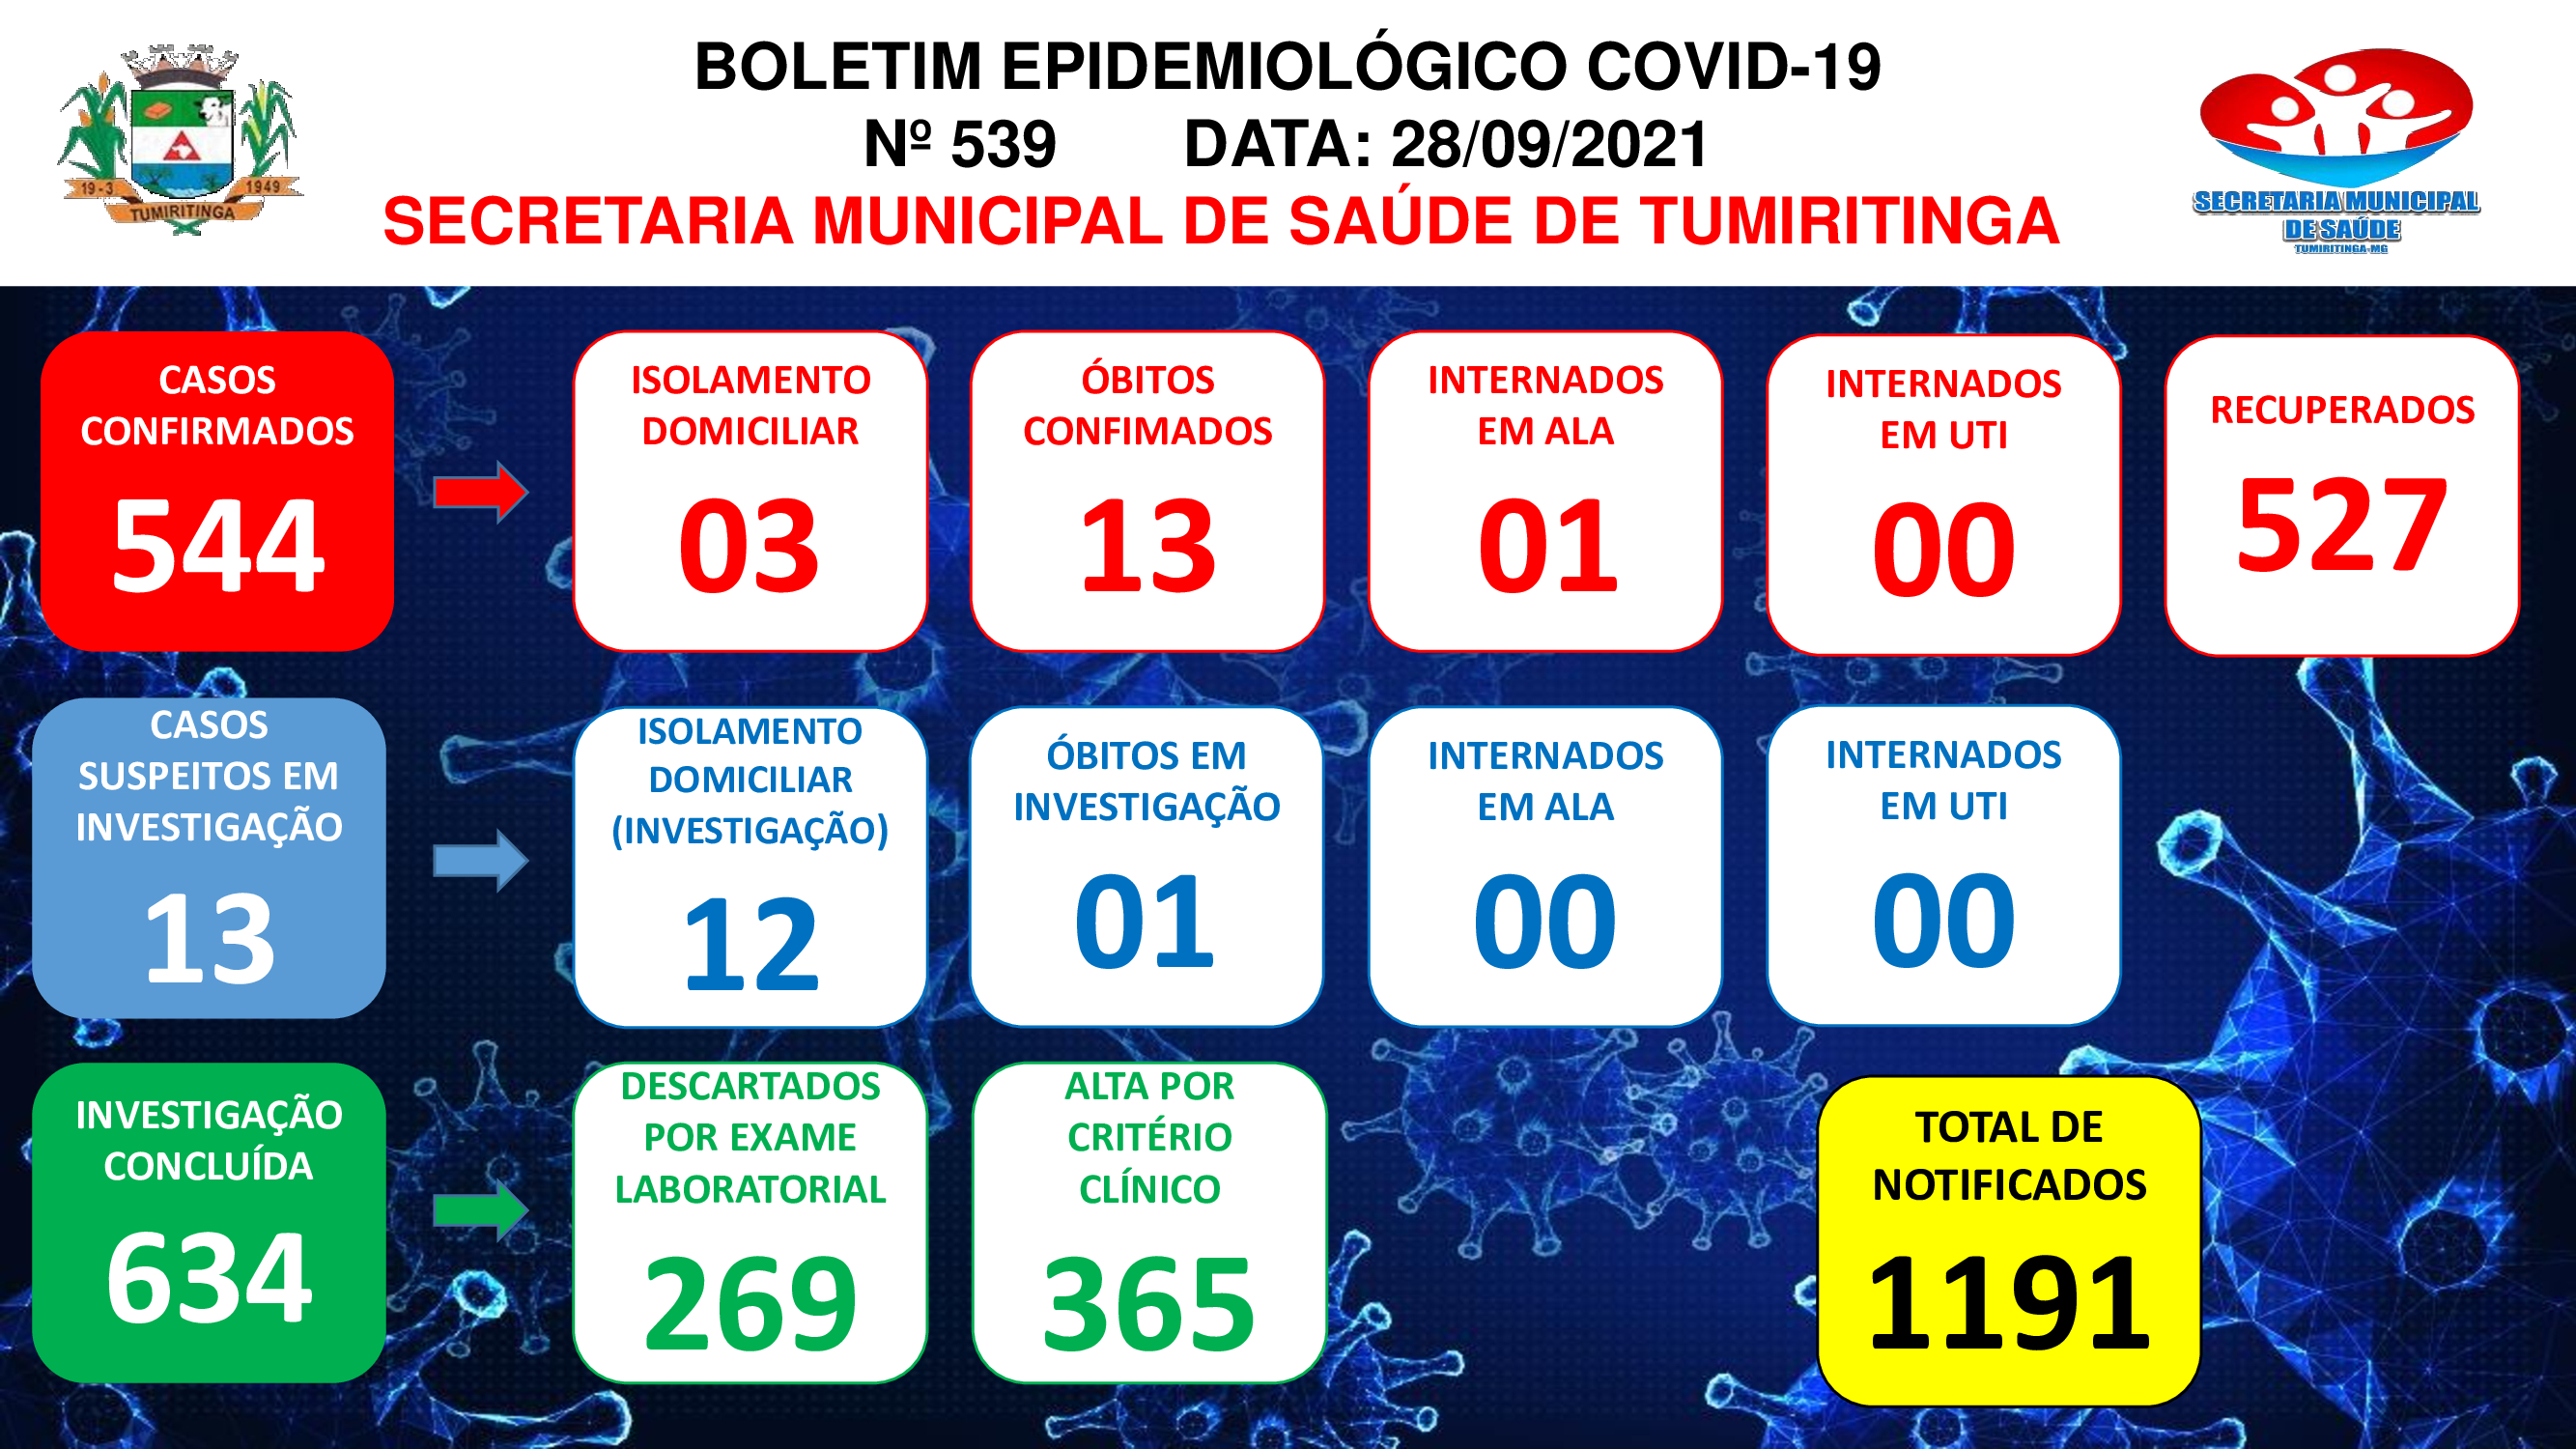 BOLETIM EPIDEMIOLÓGICO CORONAVÍRUS N° 539 - 28/09/2021